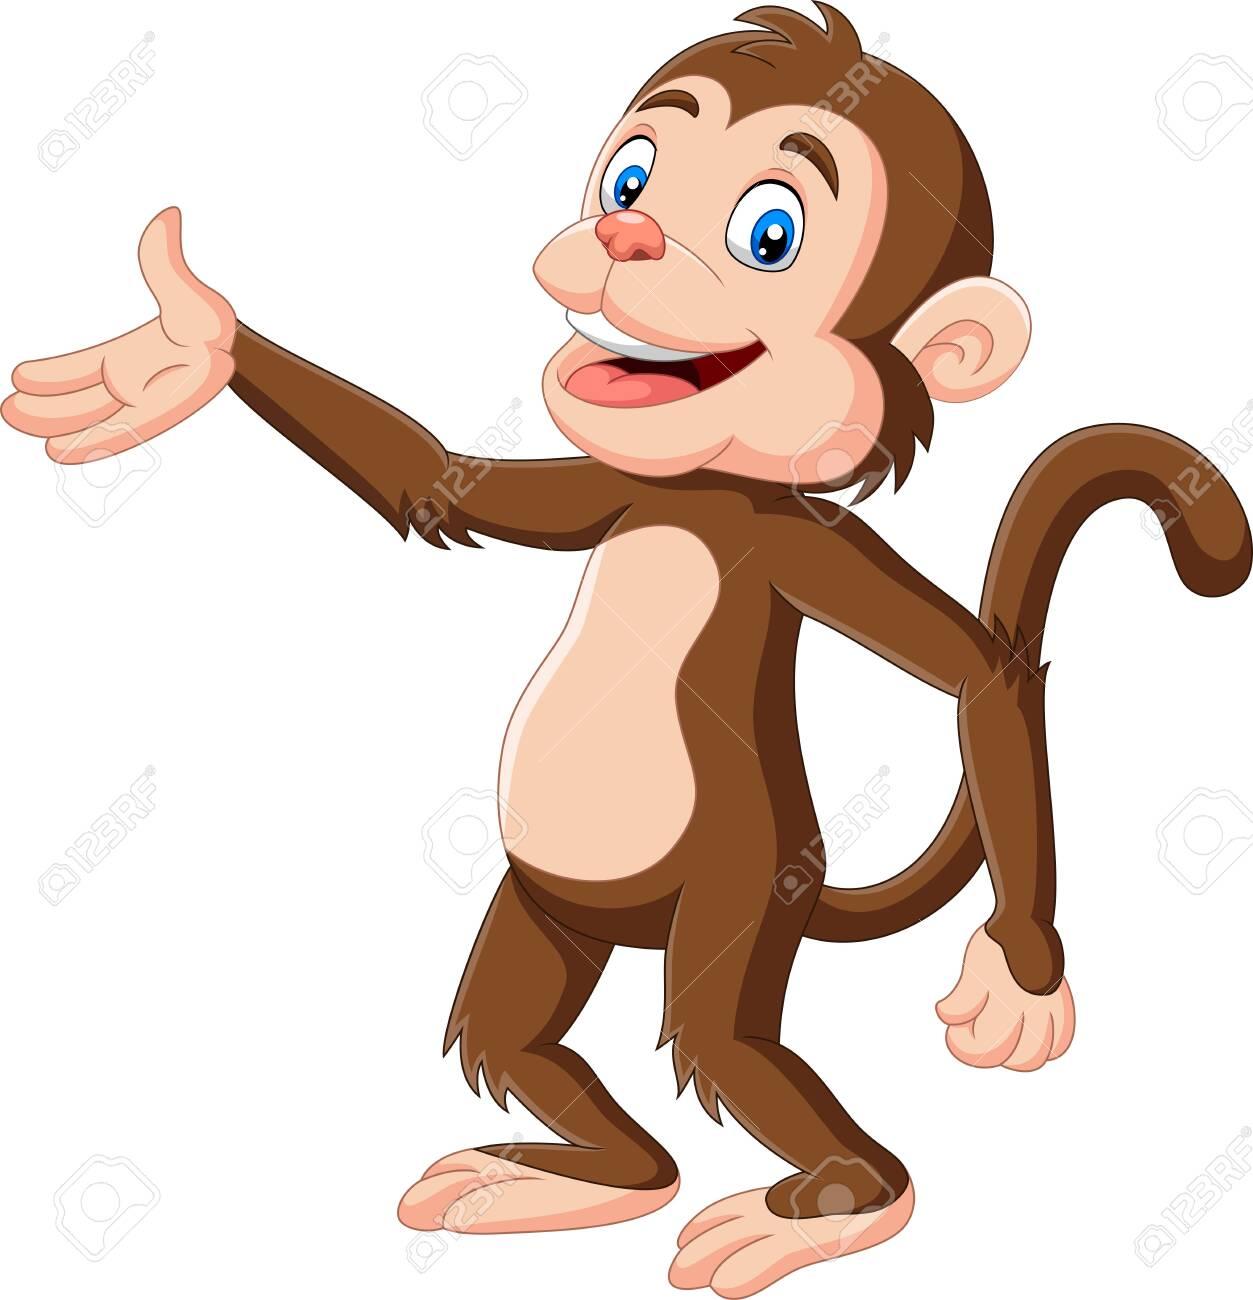 Vector illustration of Cartoon happy monkey presenting on white background - 128376878